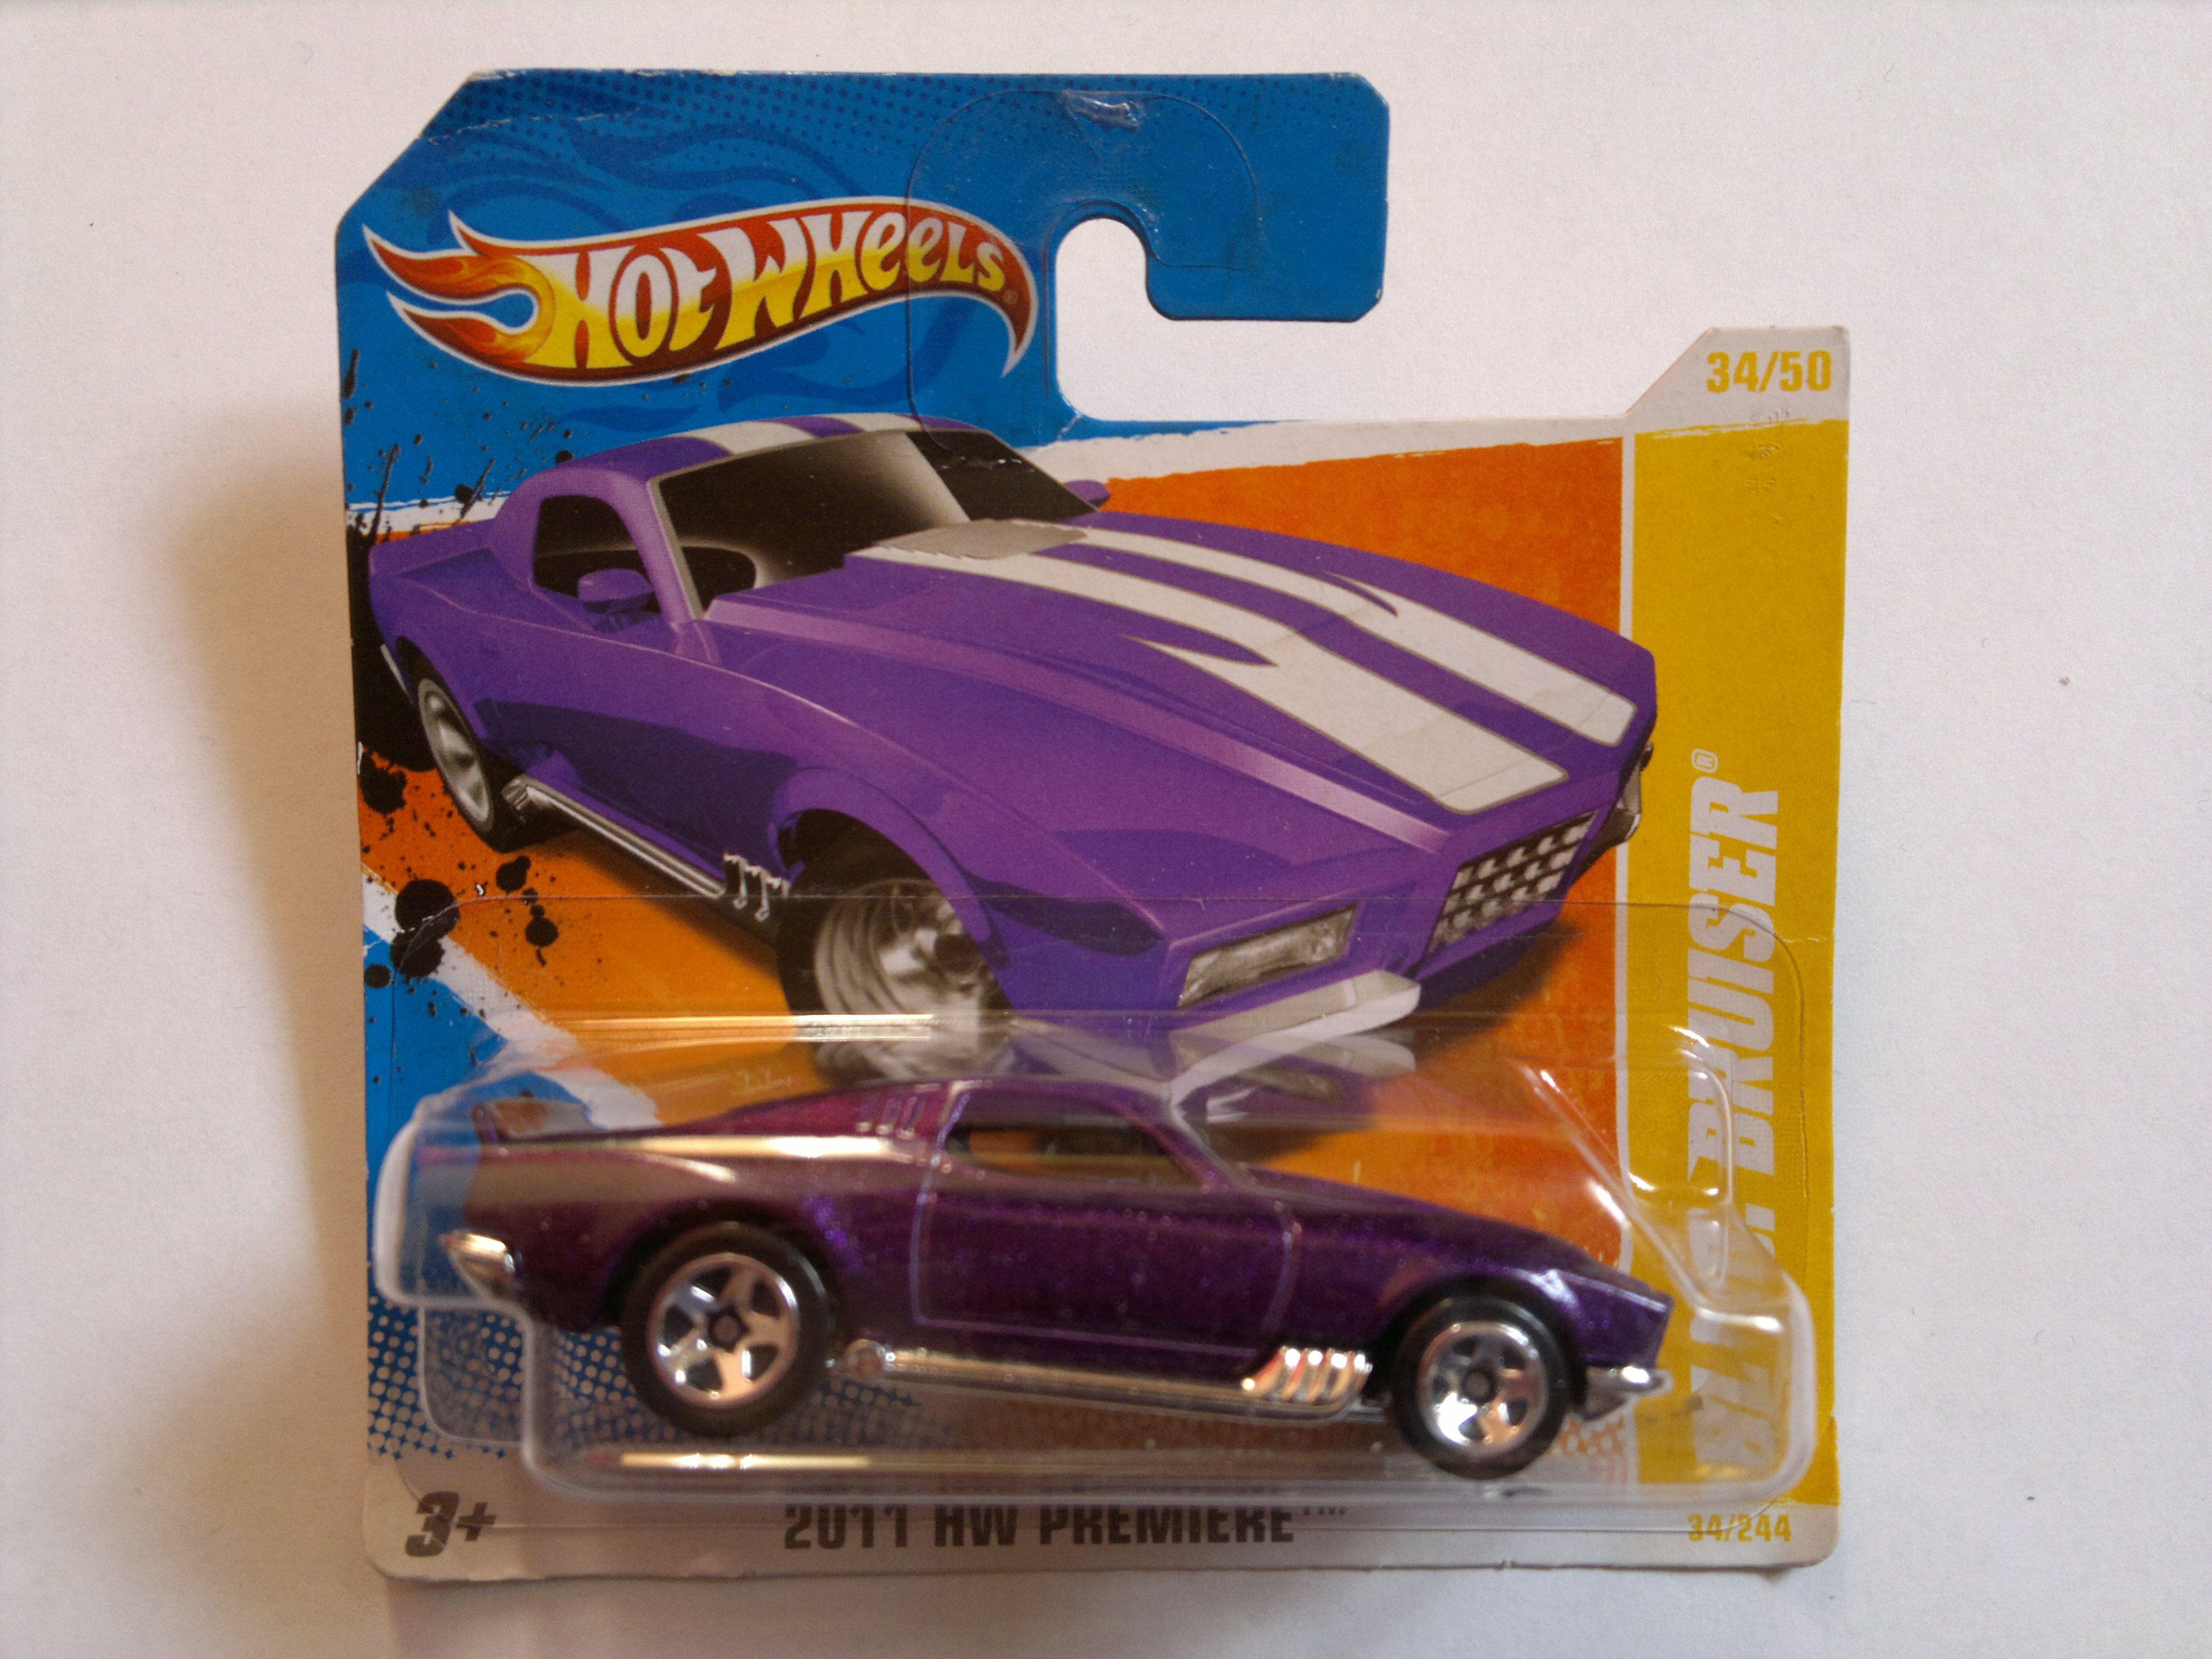 2011 - BLVD. Bruiser (Hot Wheels)